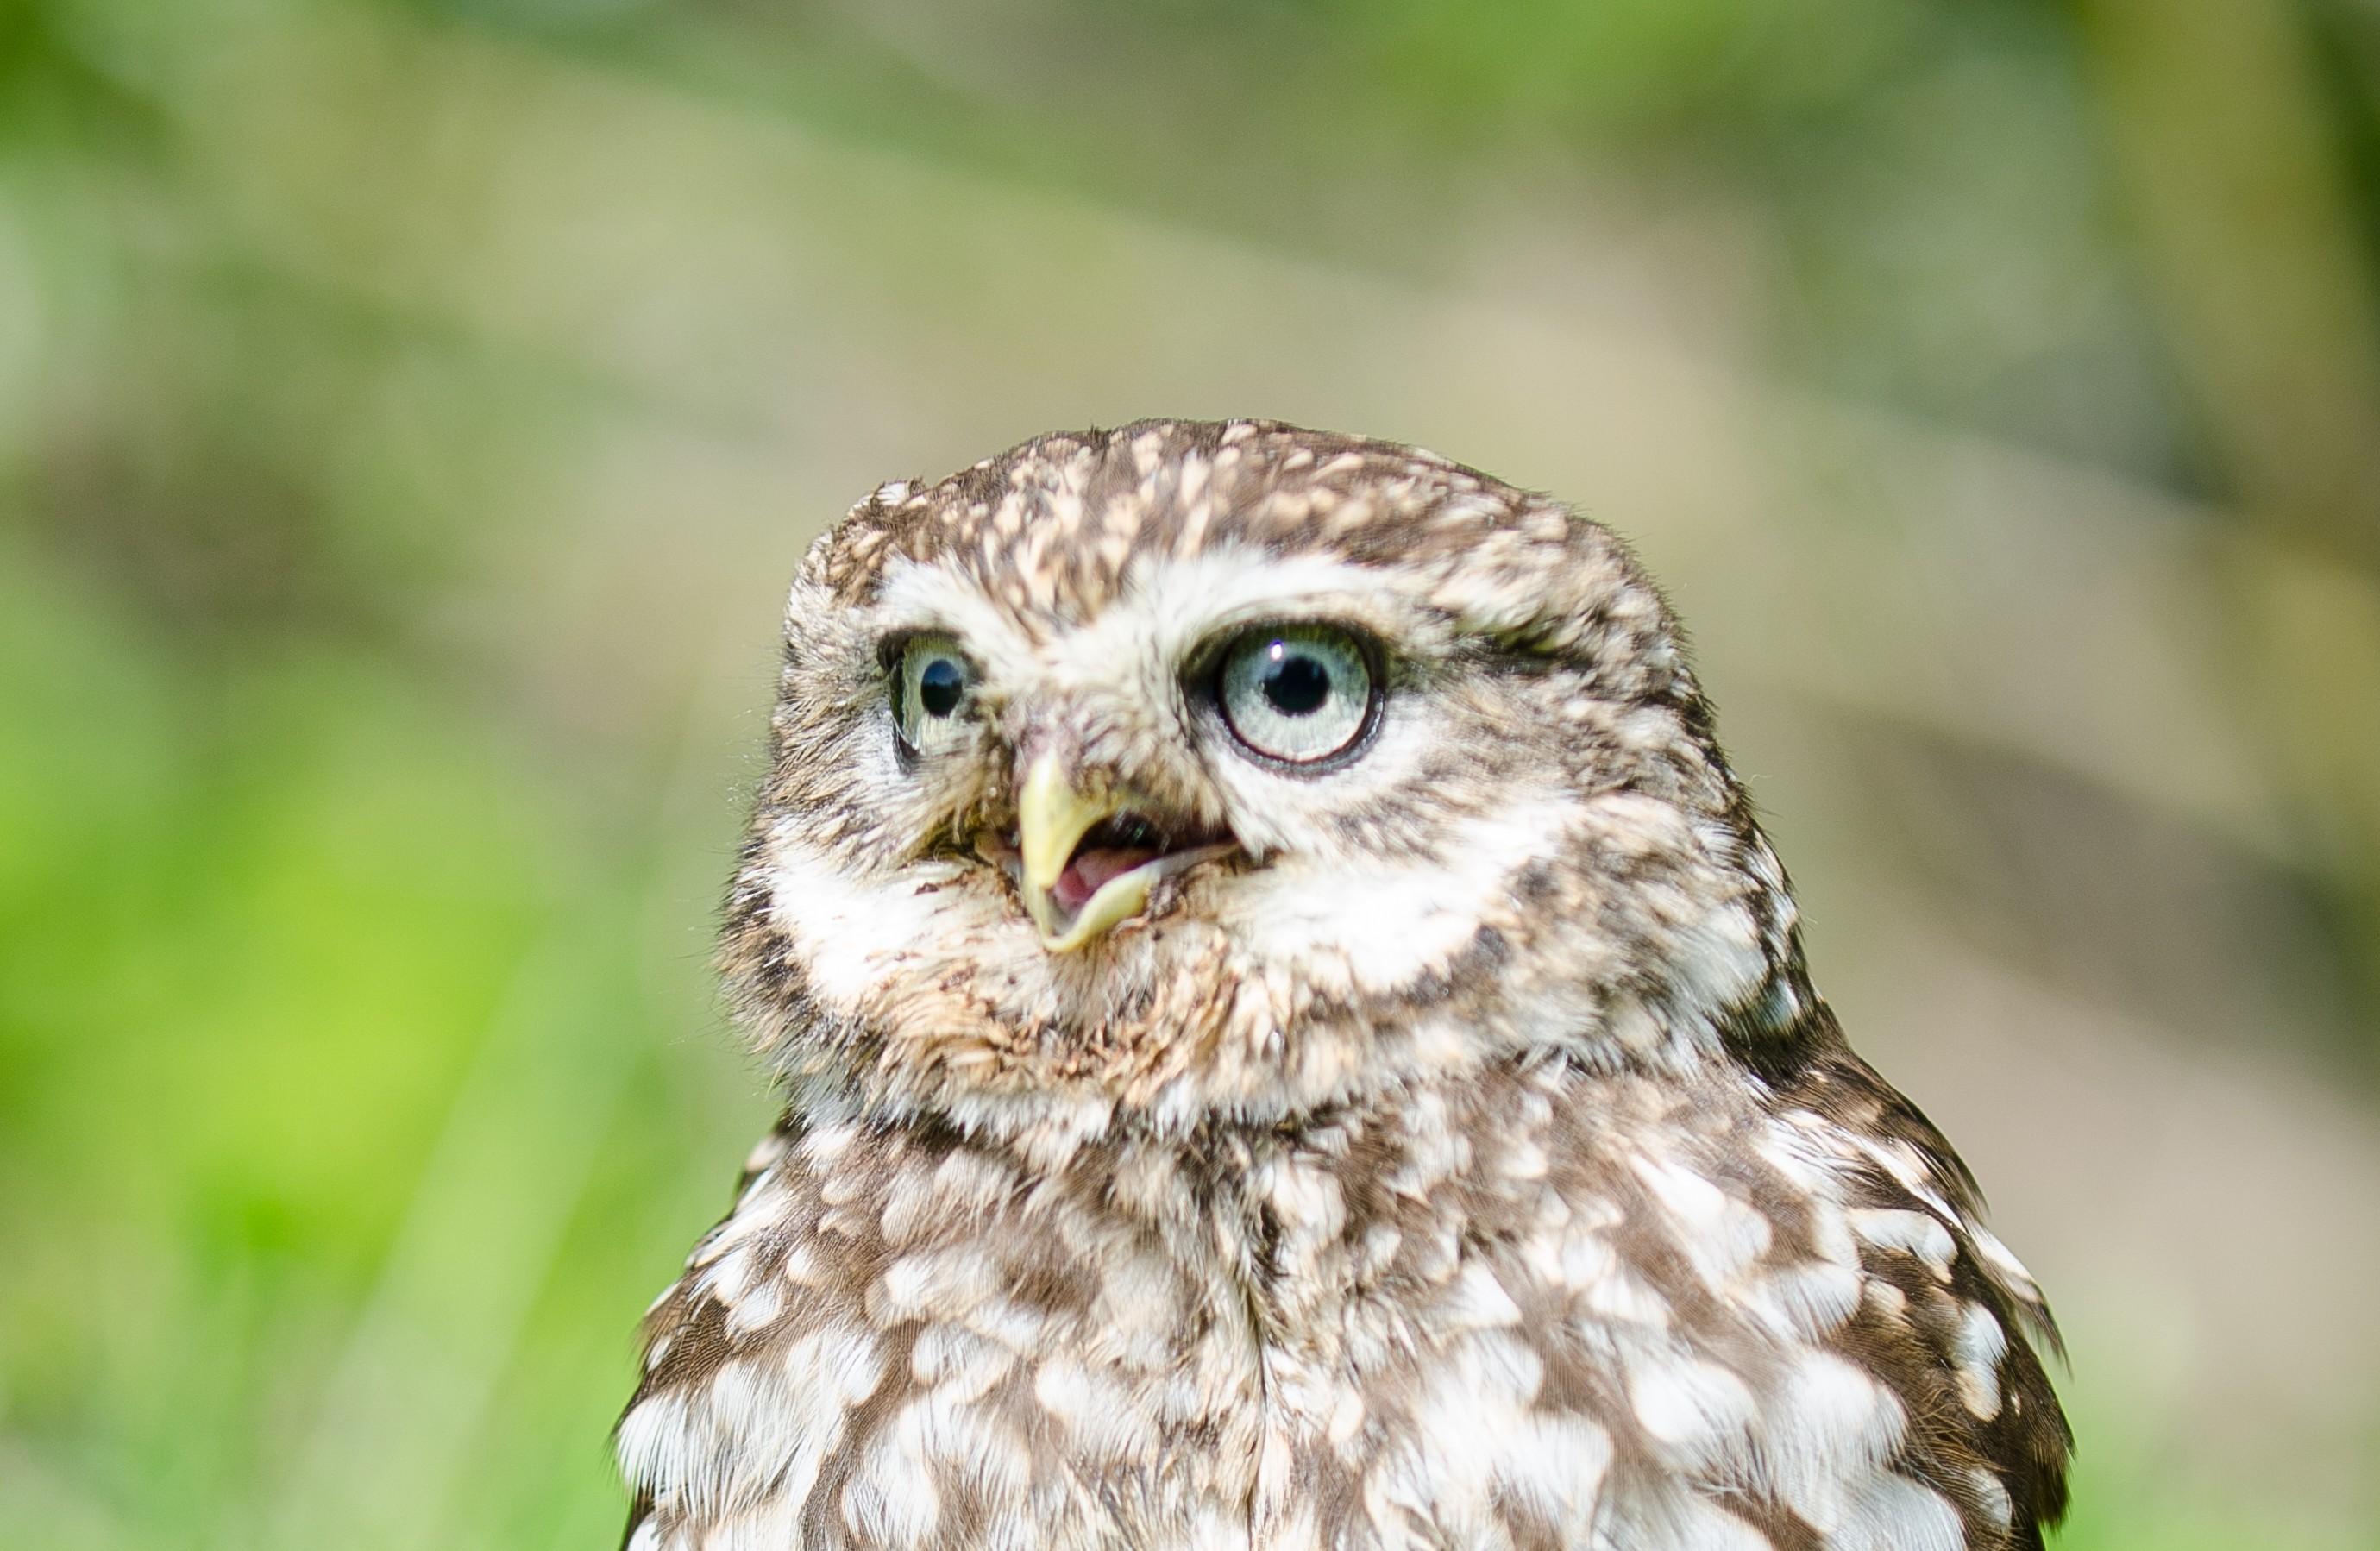 Central England Bird of Prey Sanctuary